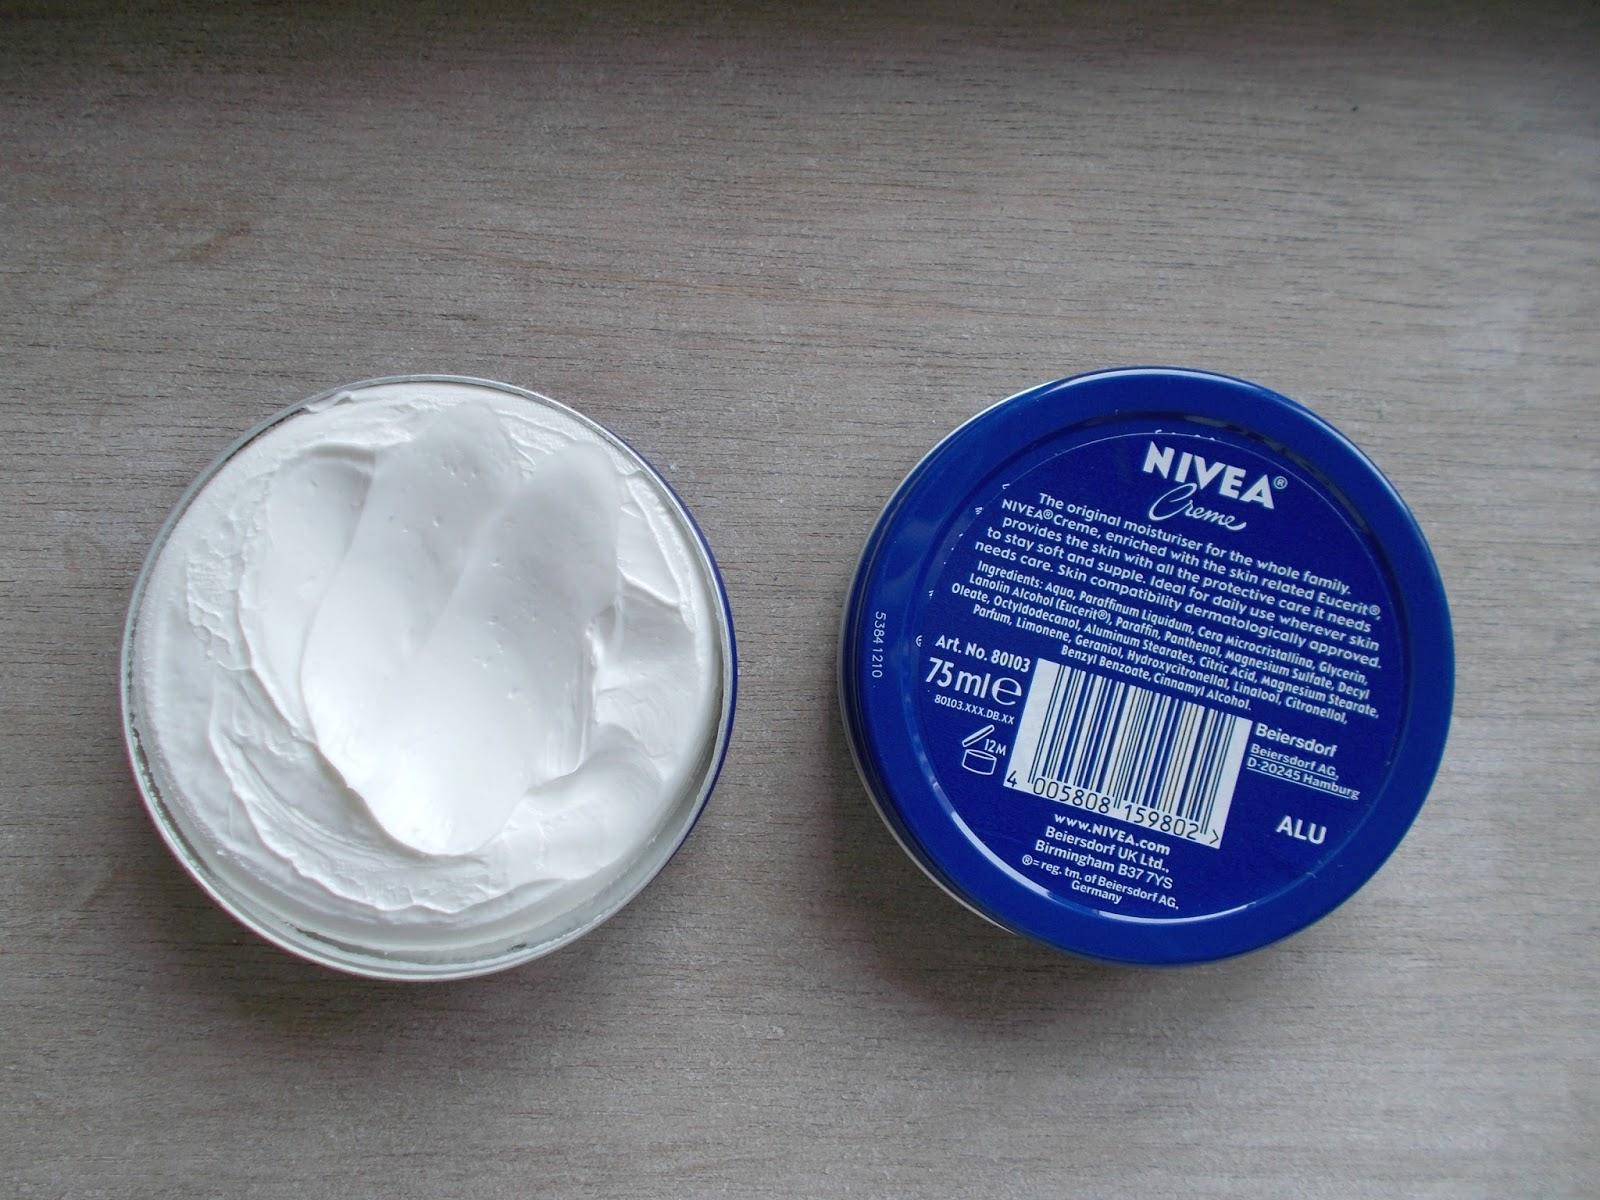 Nivea Creme 75ml limited edition tins